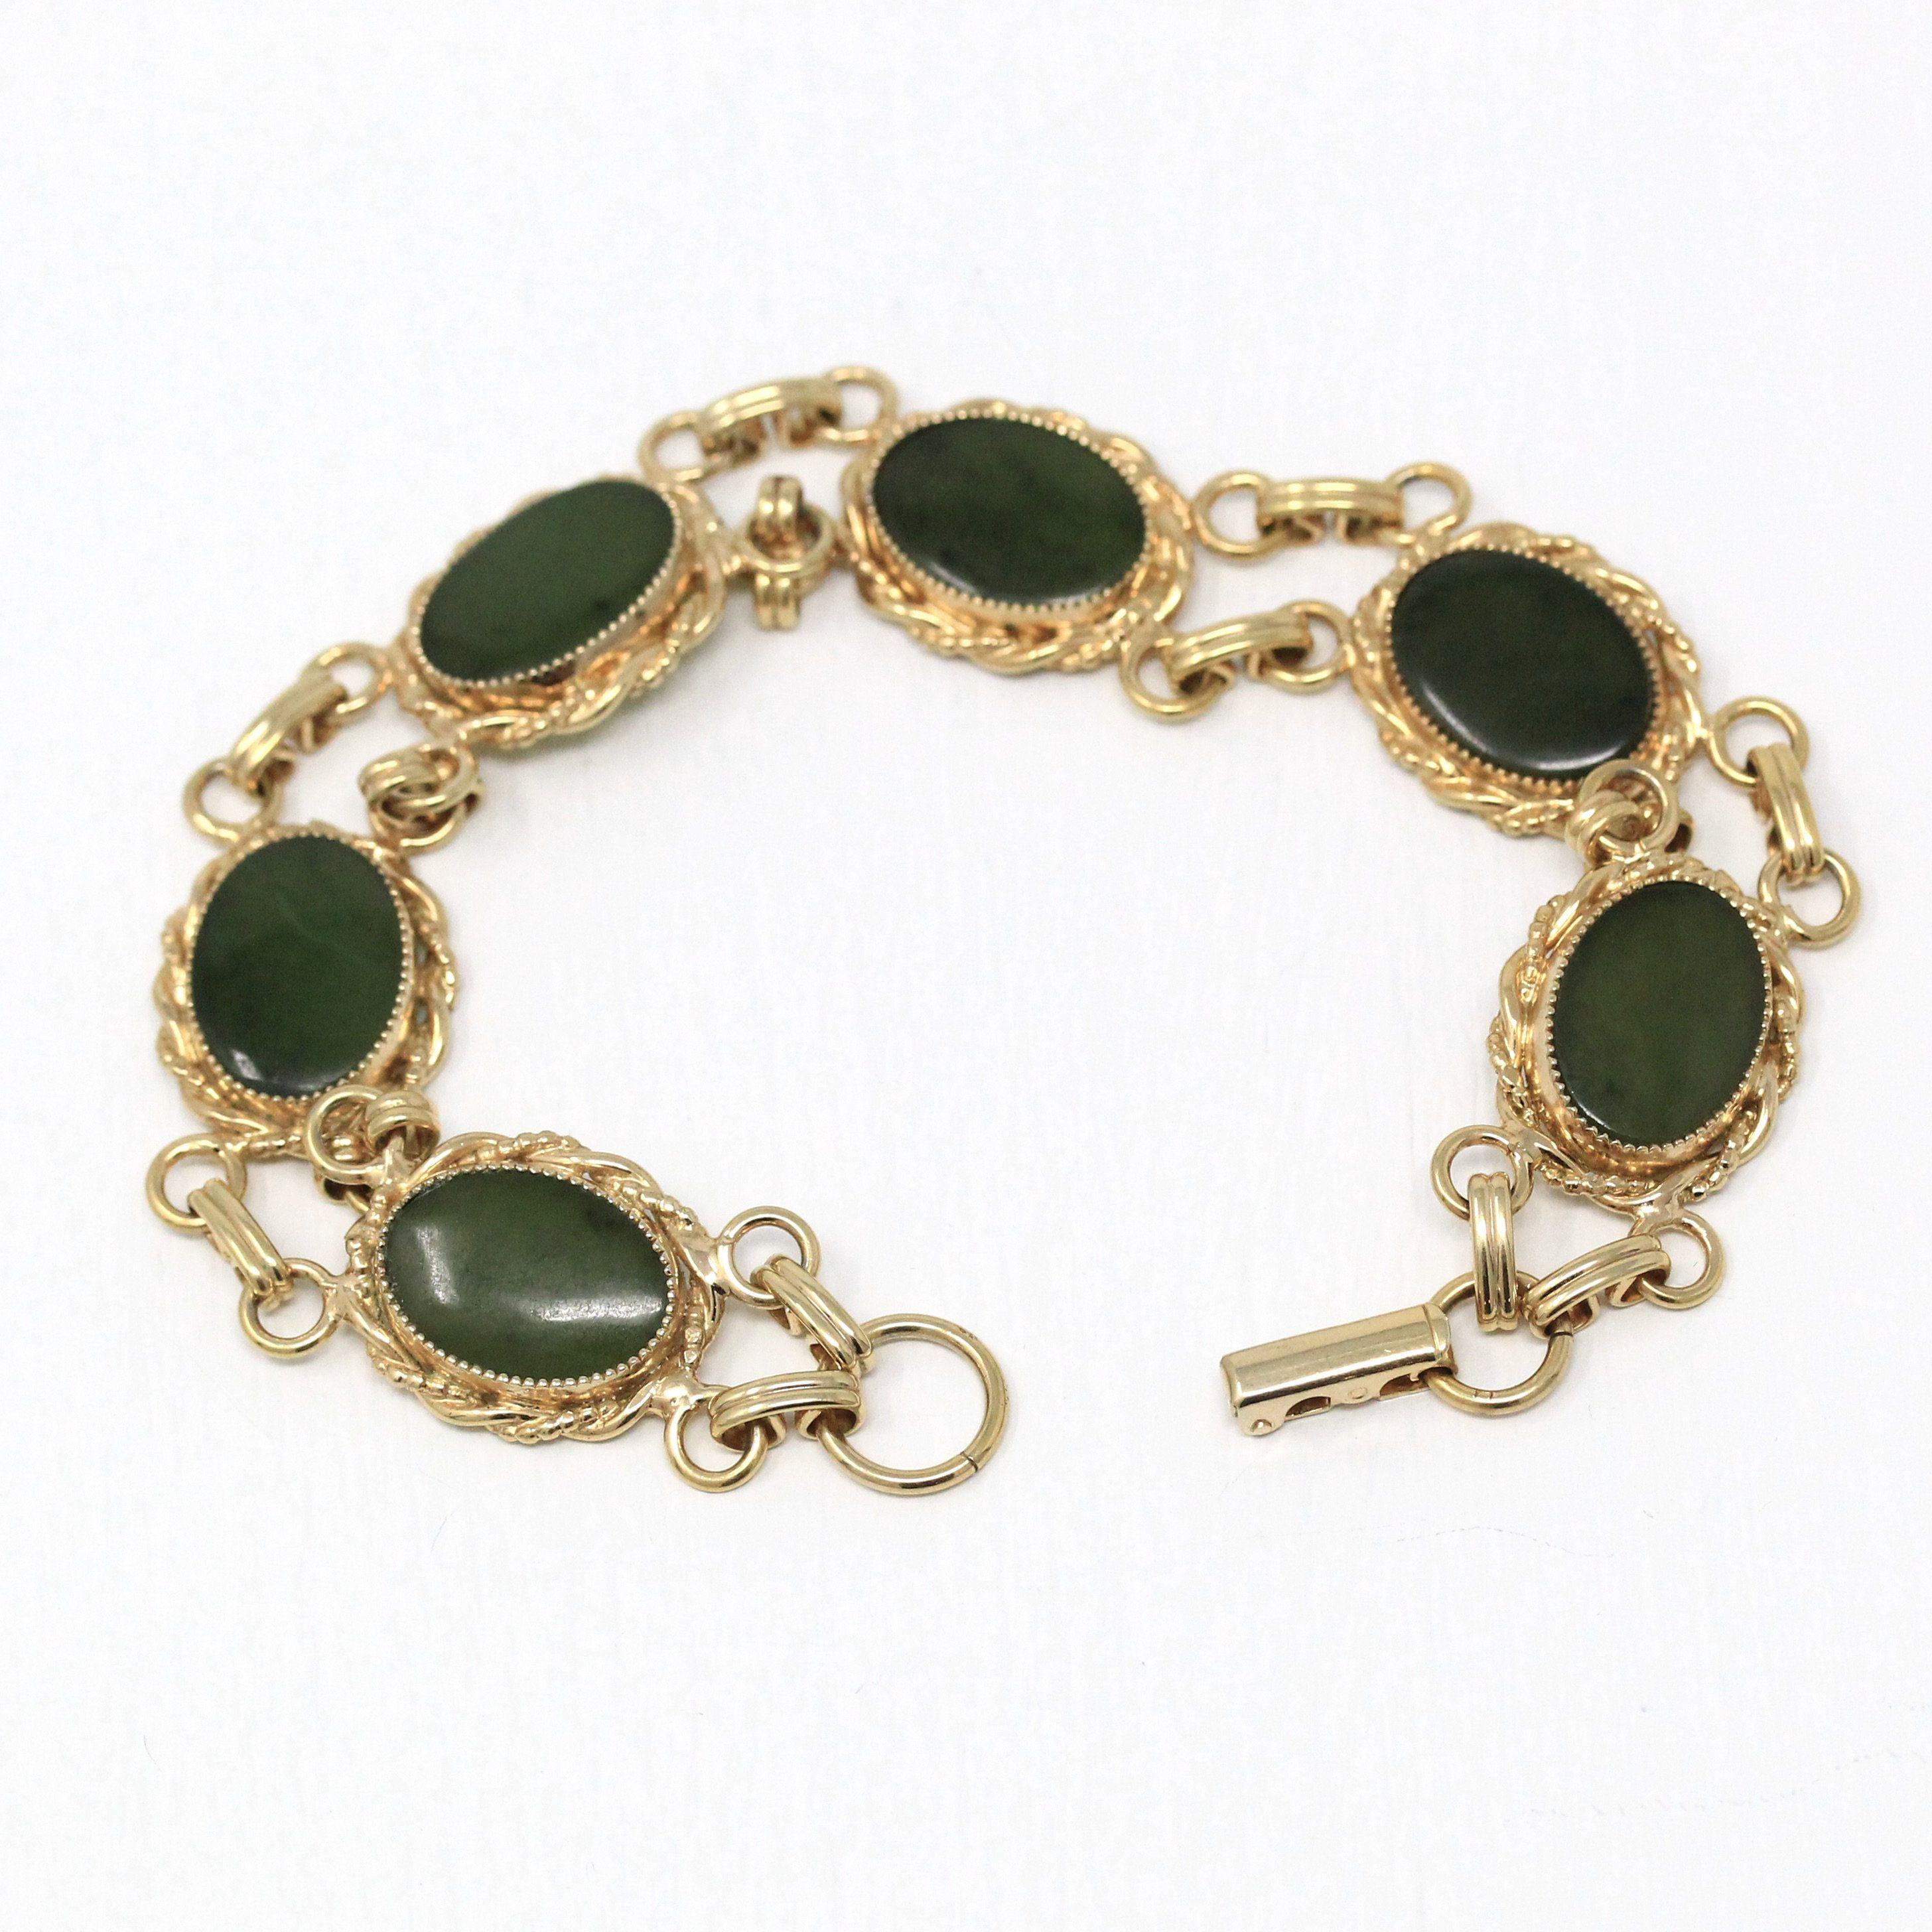 Vintage Brooch Lucky Charm 120 12k Yellow Gold Fill Emerald Rhinestones